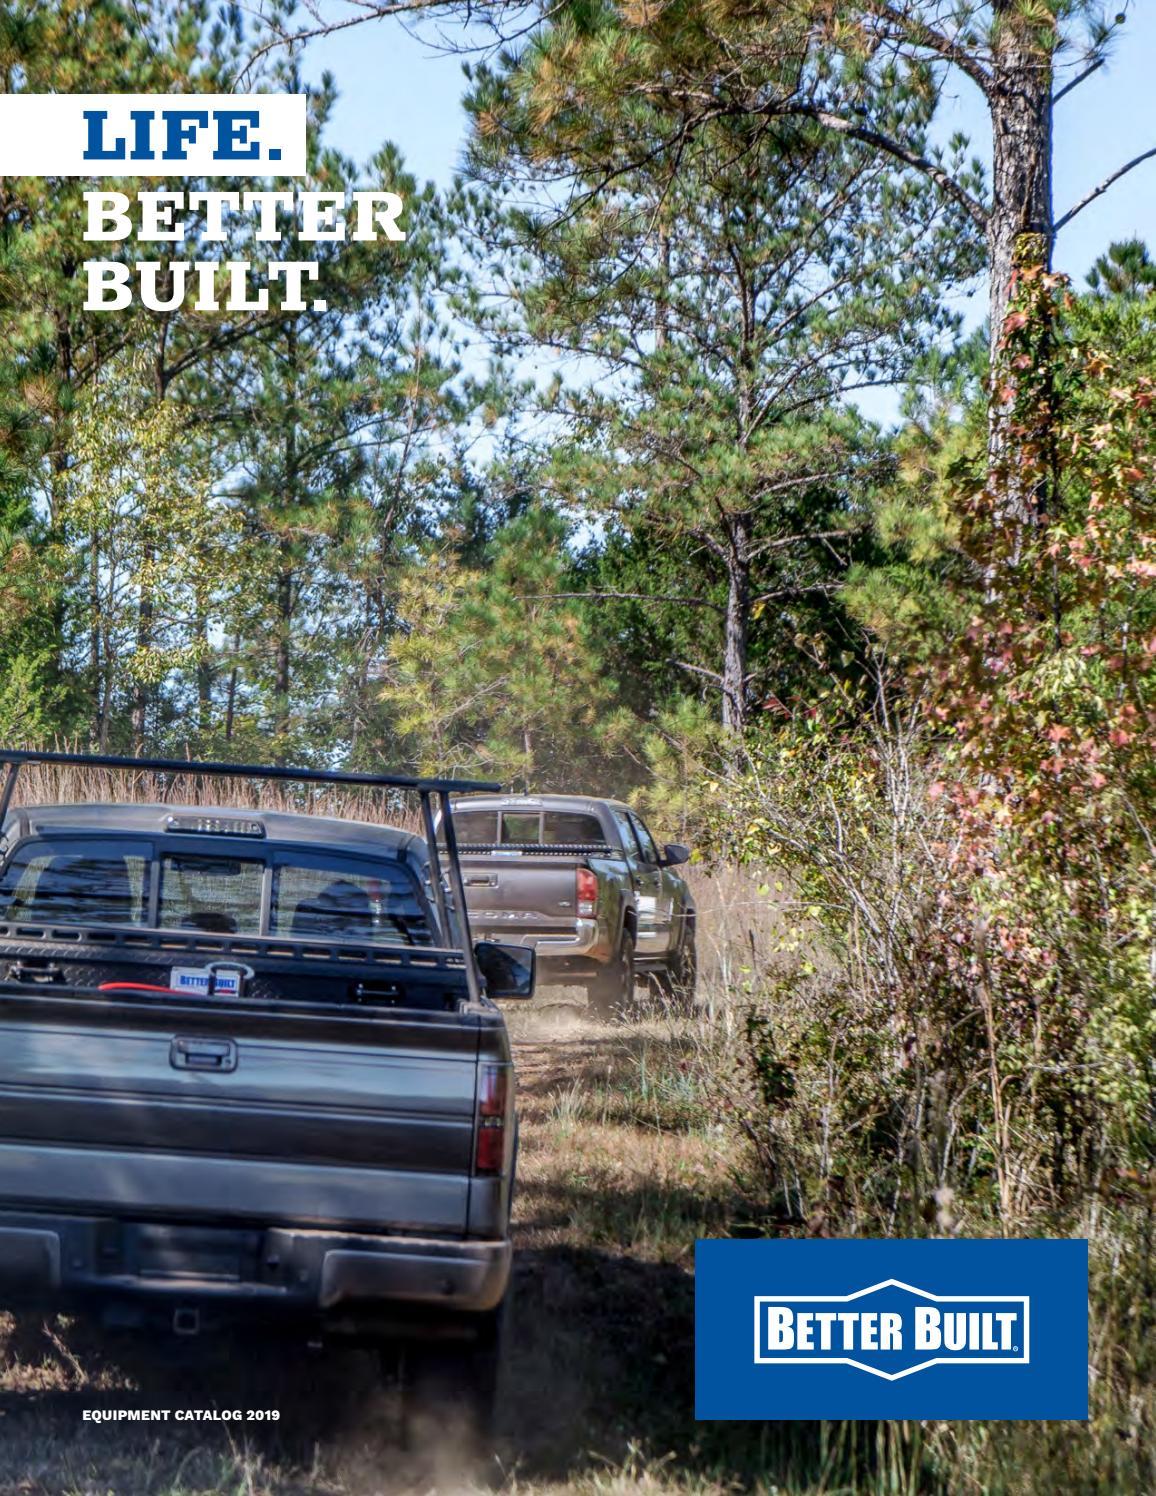 Better Built 64210152 Top Mount Tool Box